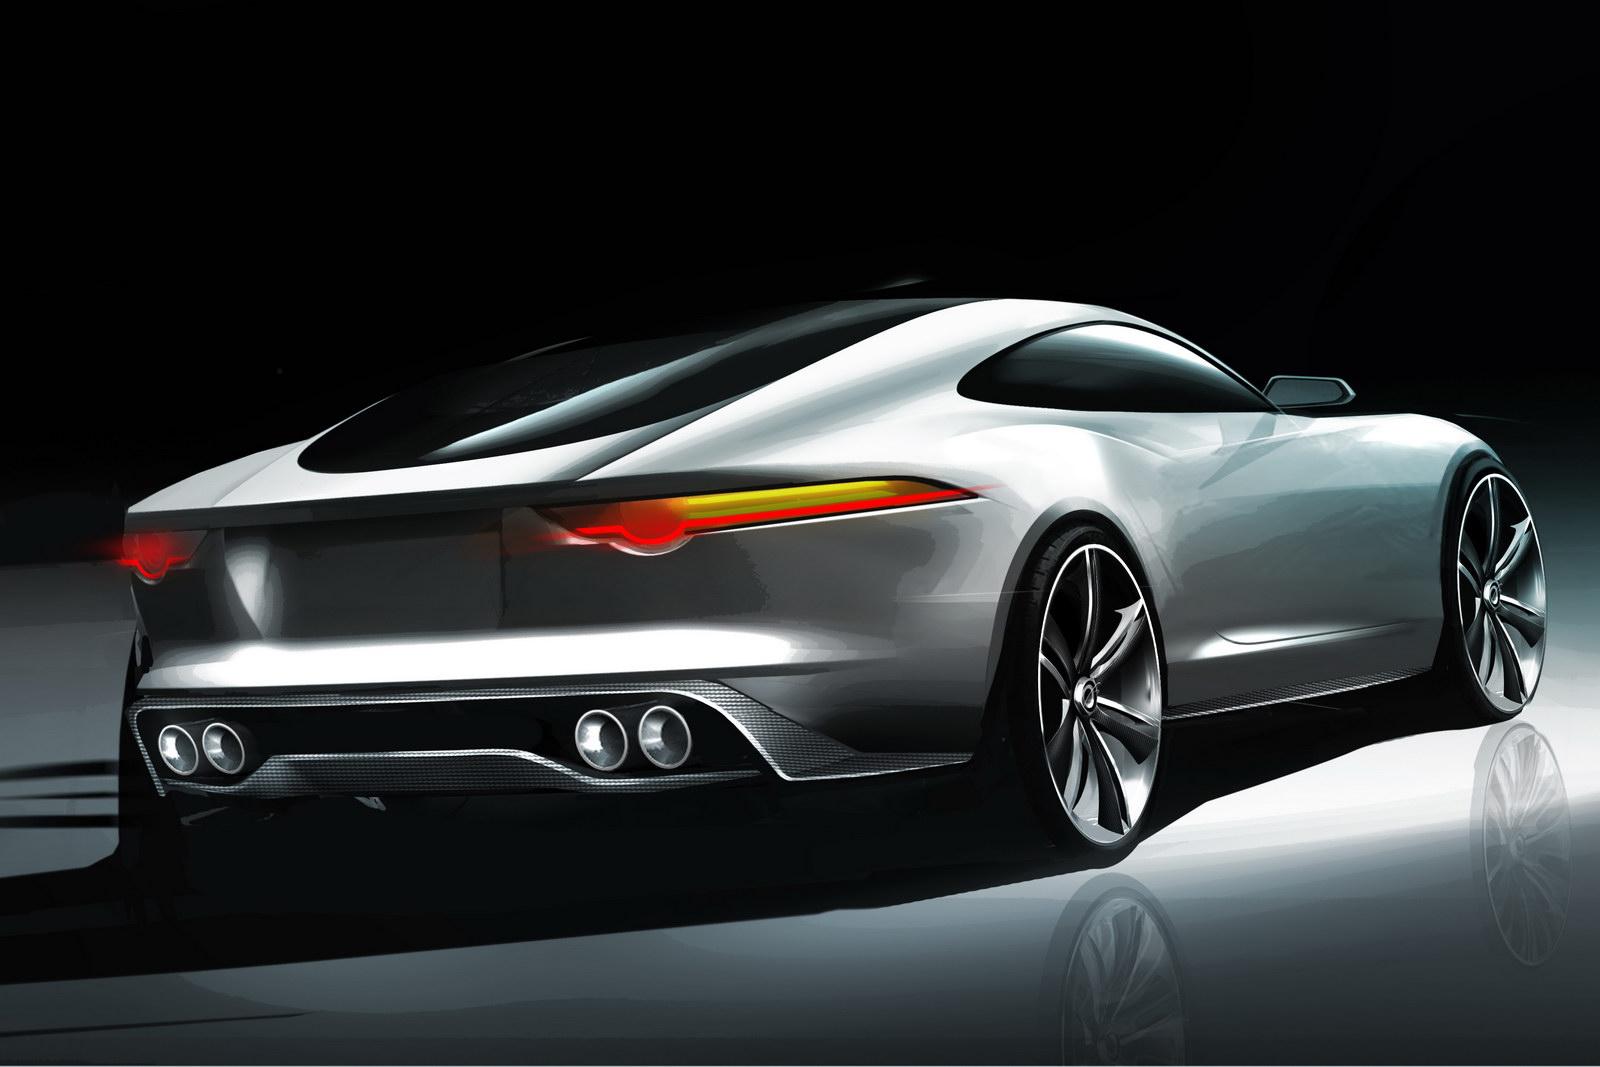 http://2.bp.blogspot.com/-B3gQSk8hqh0/TmzQupsWOfI/AAAAAAAAET0/VWhFENfgzuU/s1600/Jaguar-C-X16+%25282%2529.jpg